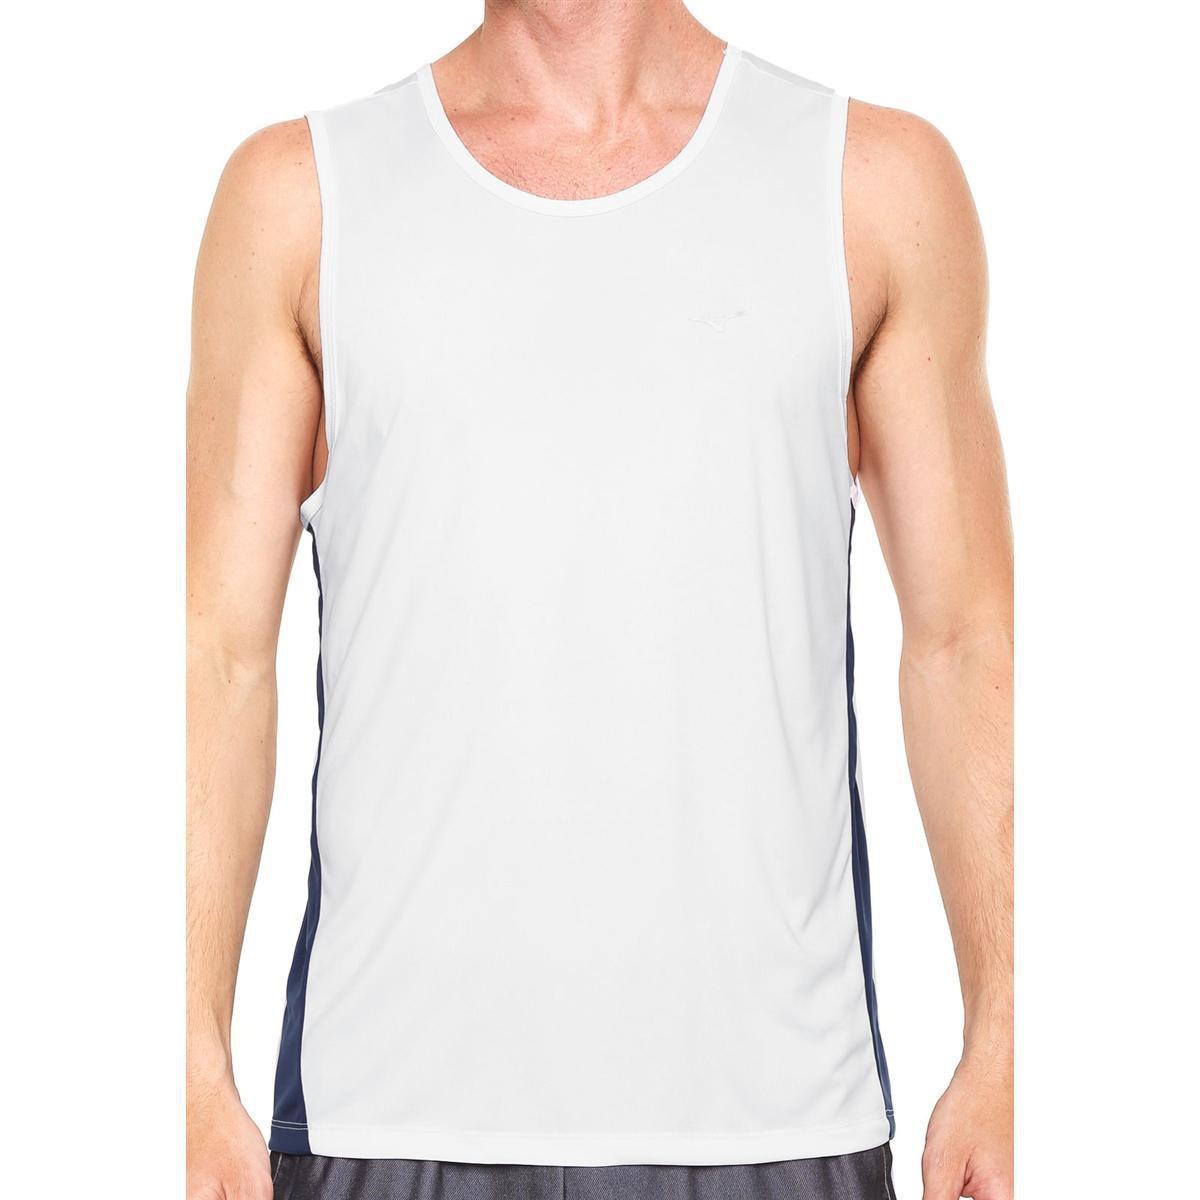 Camiseta Regata Mizuno Wave Run 2 Masculina - Branco e Azul - Compre Agora   8aeb81ea6f8